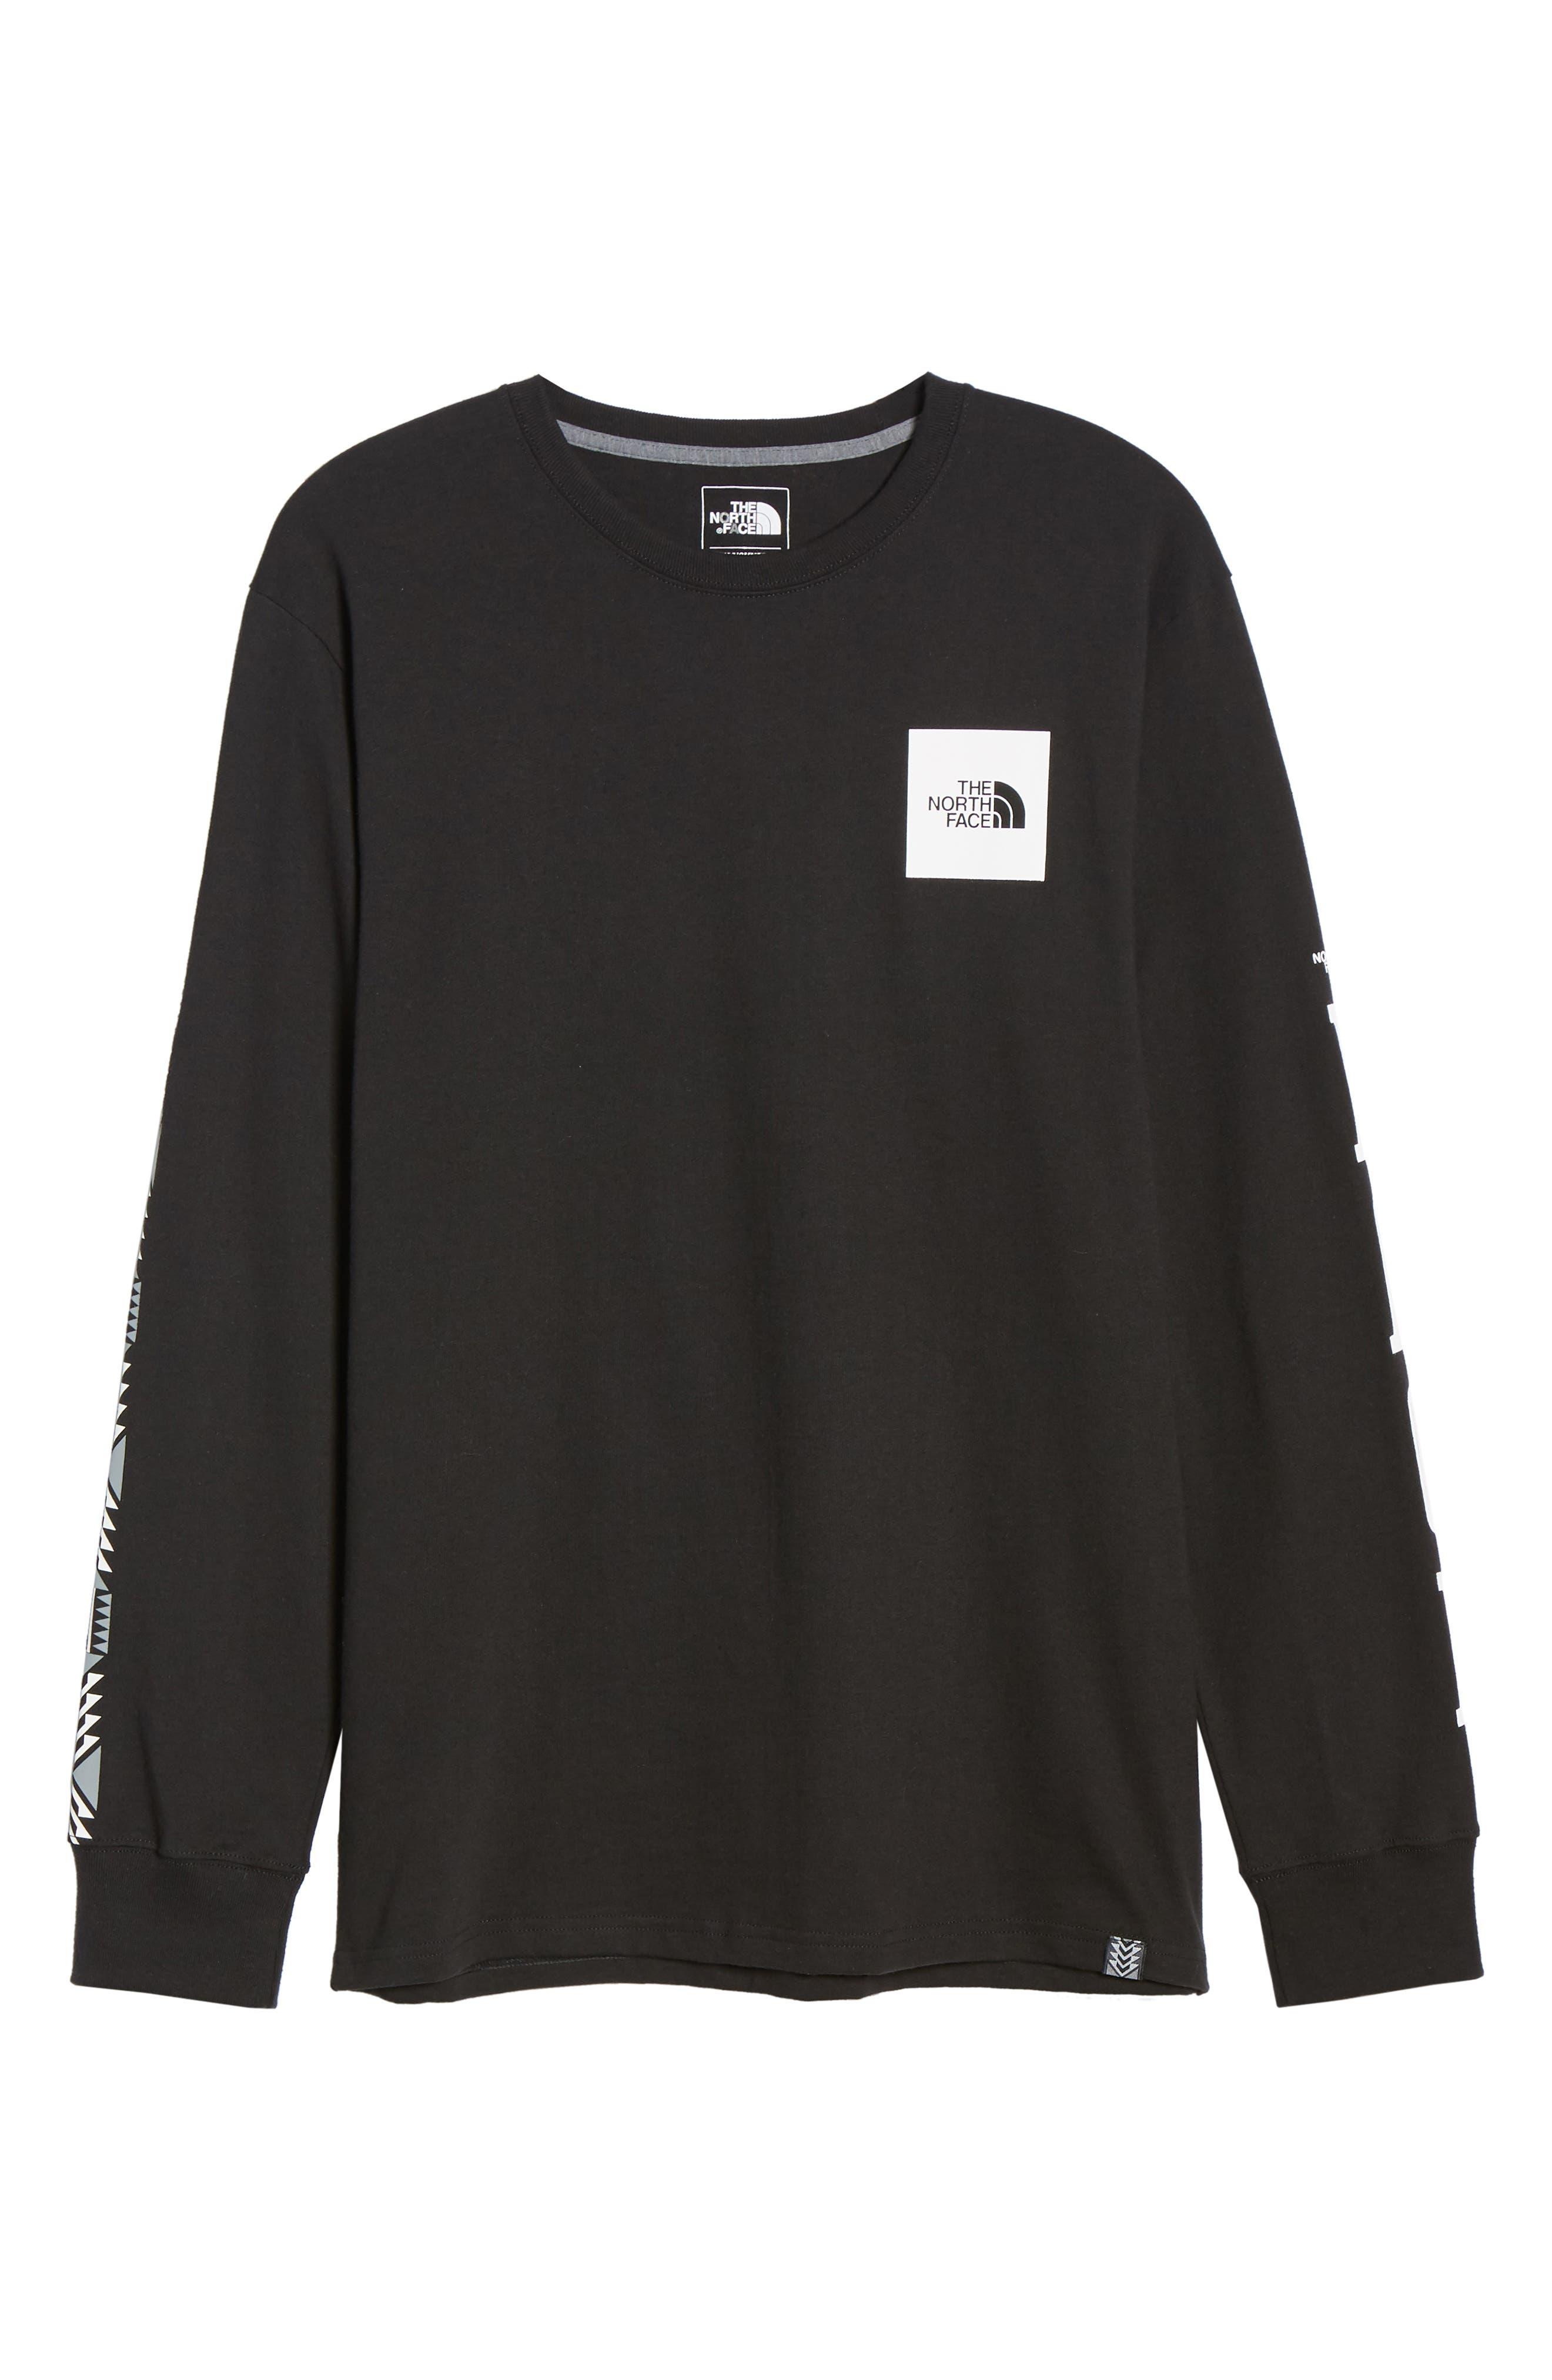 1992 Rage Collection T-Shirt,                             Alternate thumbnail 6, color,                             TNF BLACK